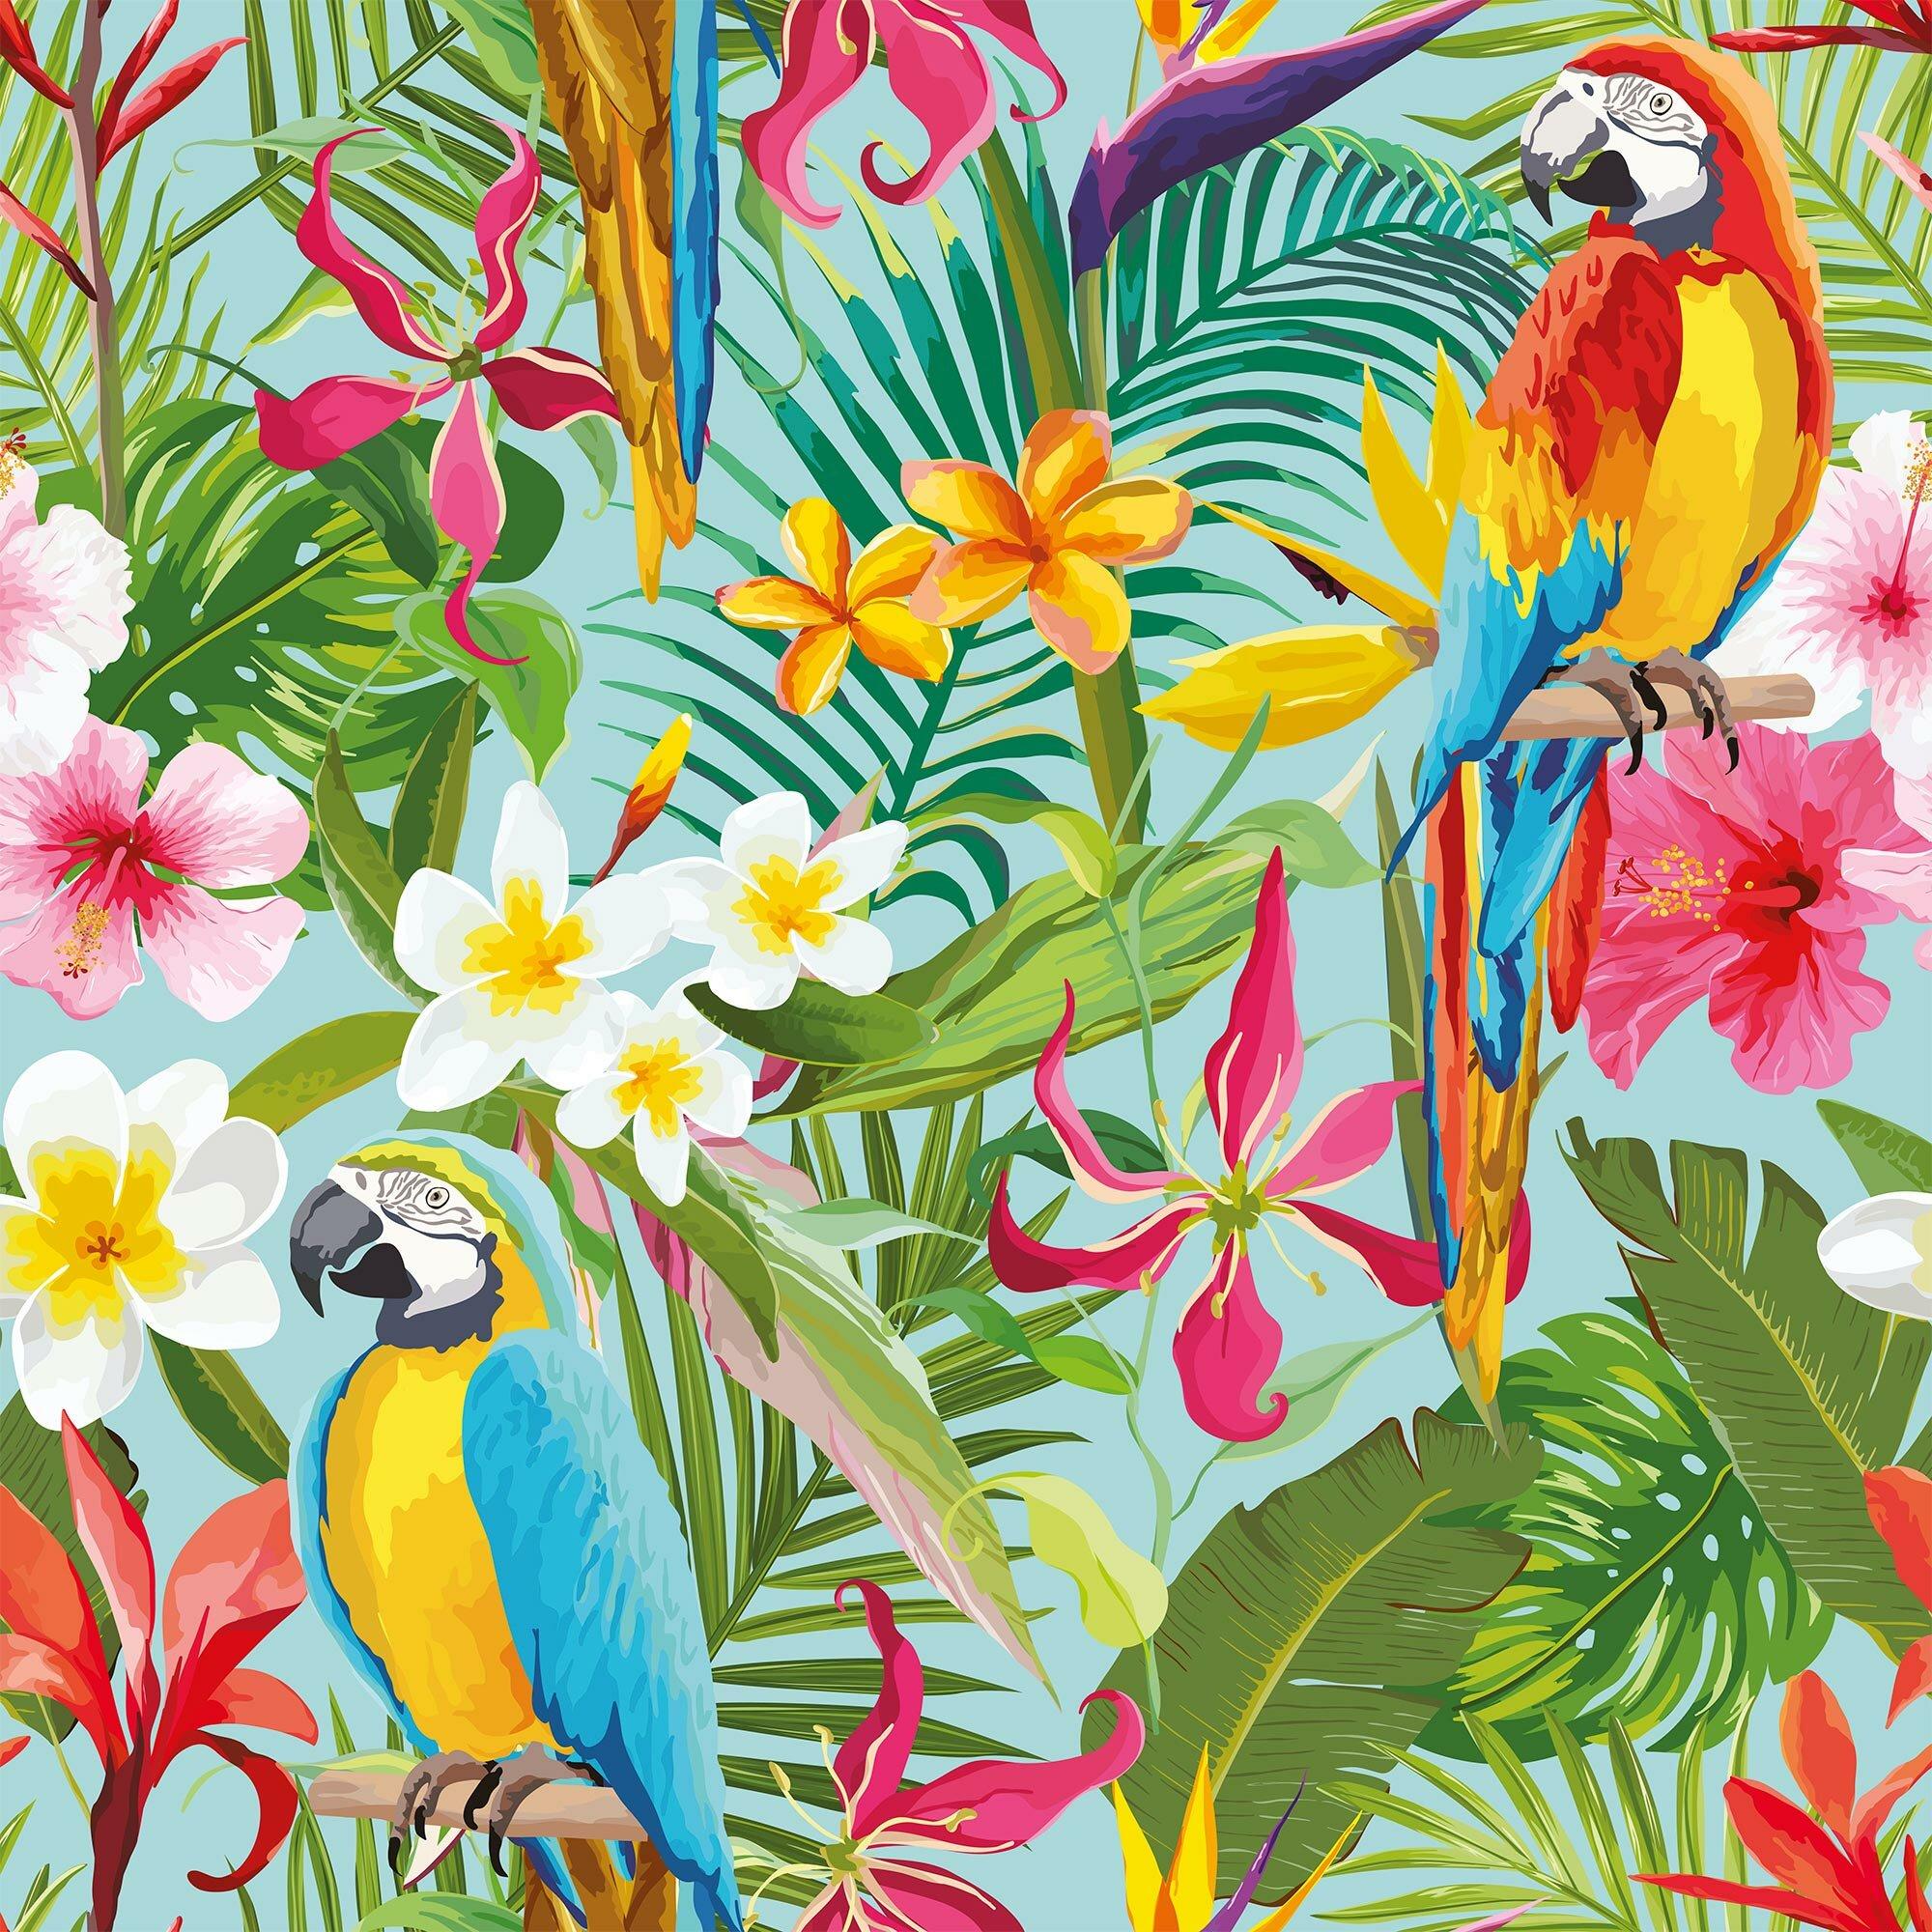 Bay Isle Home Mayer Tropical Removable Peel And Stick Wallpaper Panel Wayfair